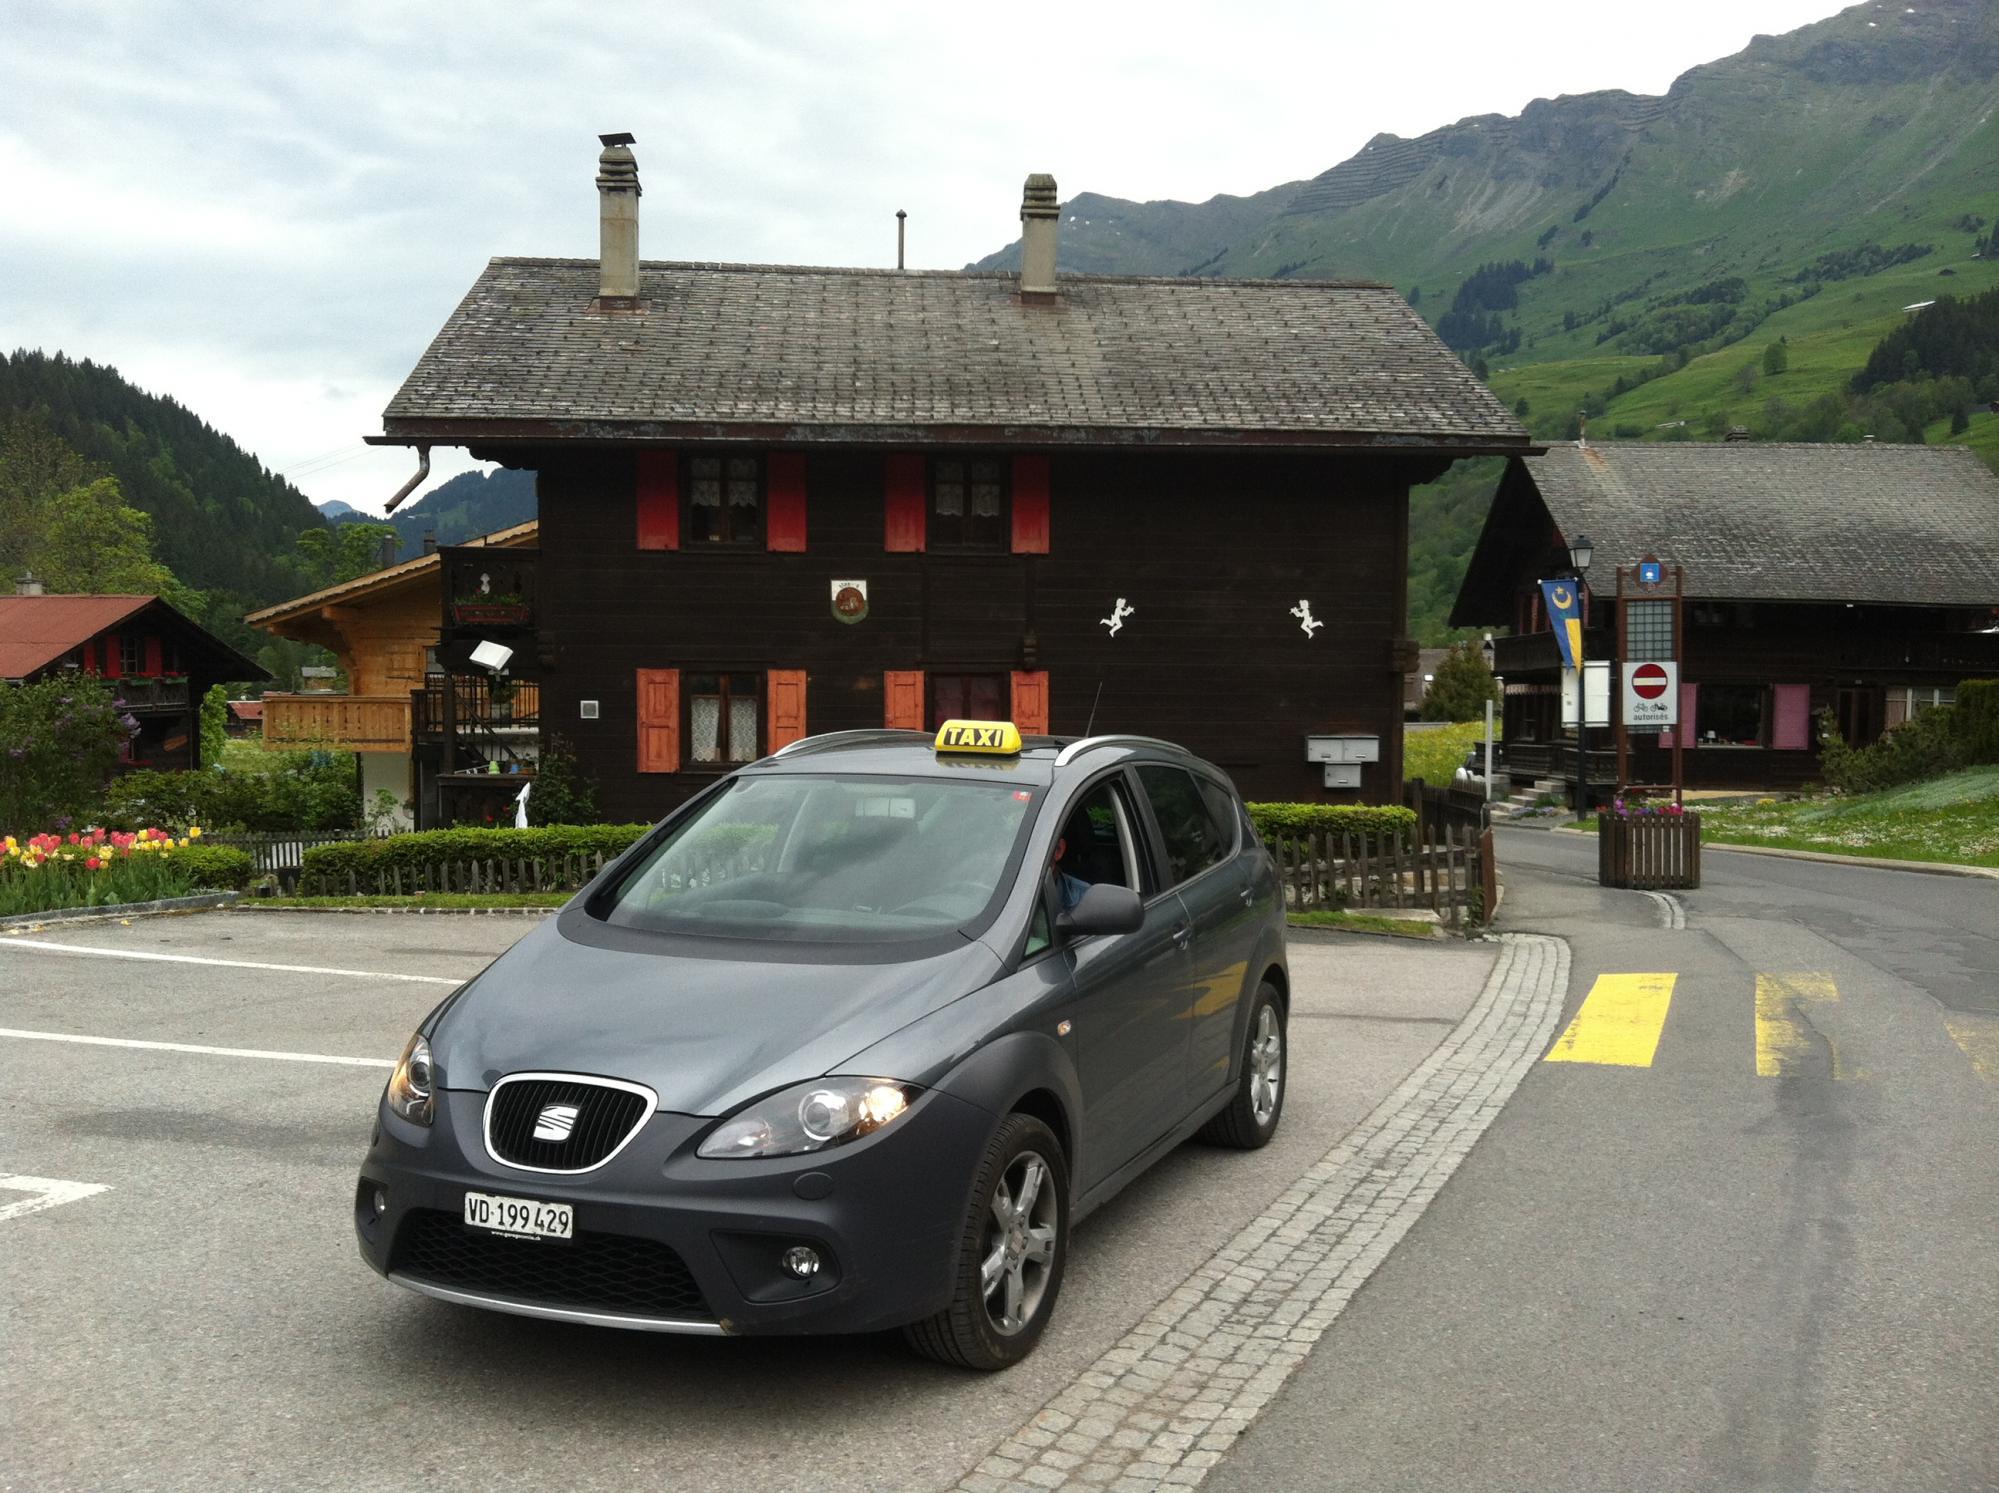 Taxis - Villars-Gryon – Les Diablerets – Bex (Switzerland)